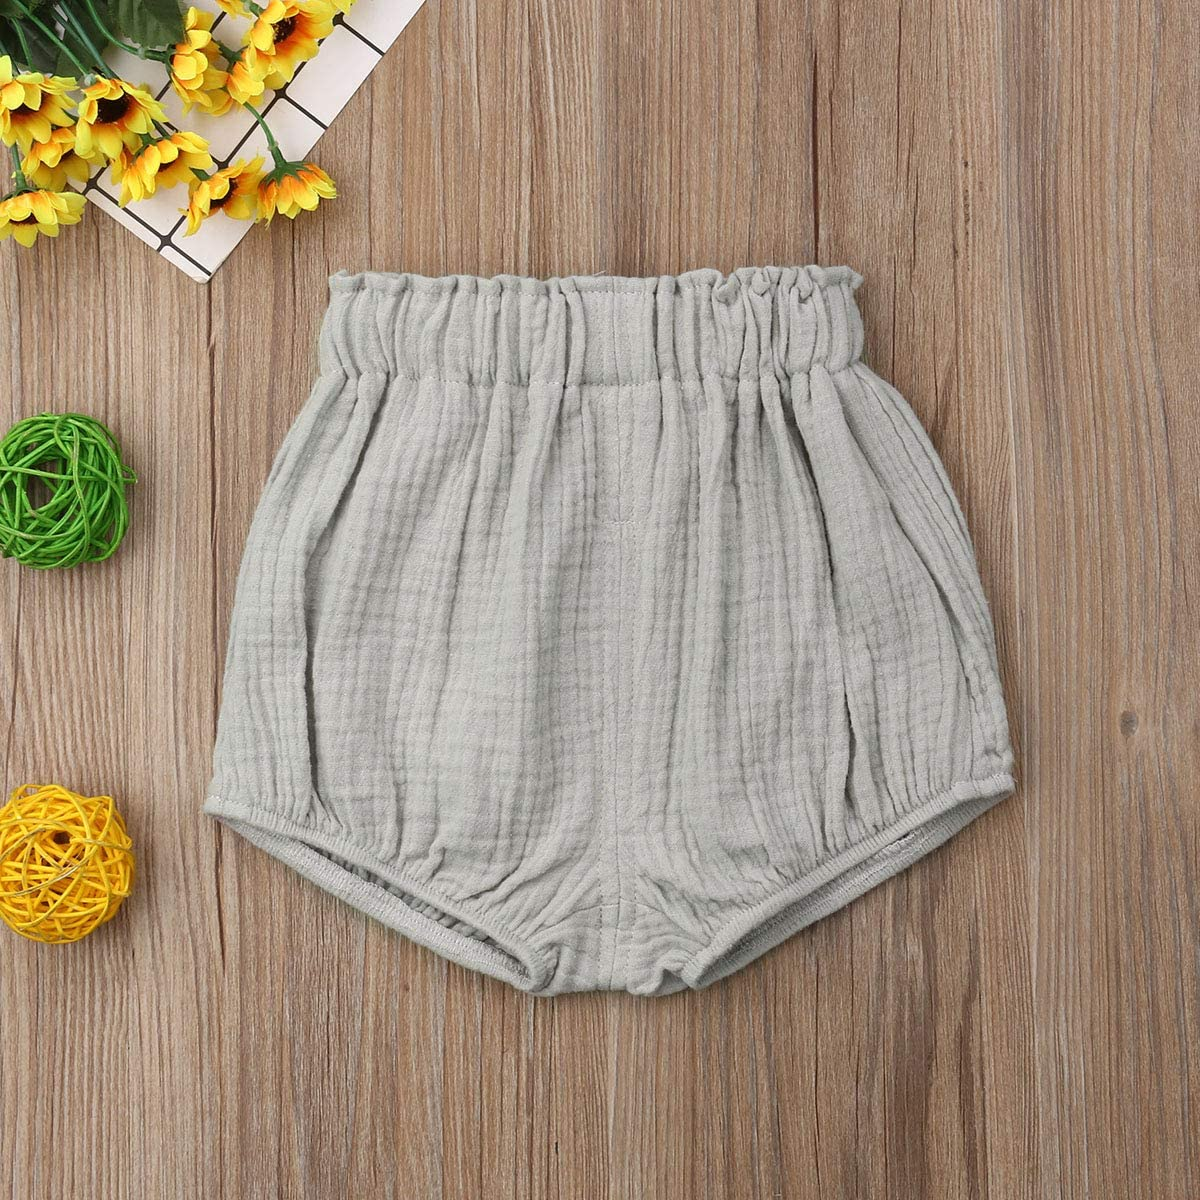 Shorts for Newborn Baby Cotton Bermuda Underwear Cotton Linen Blend for Children Girls Leggings Flared Shorts Baby Girls Bloomers